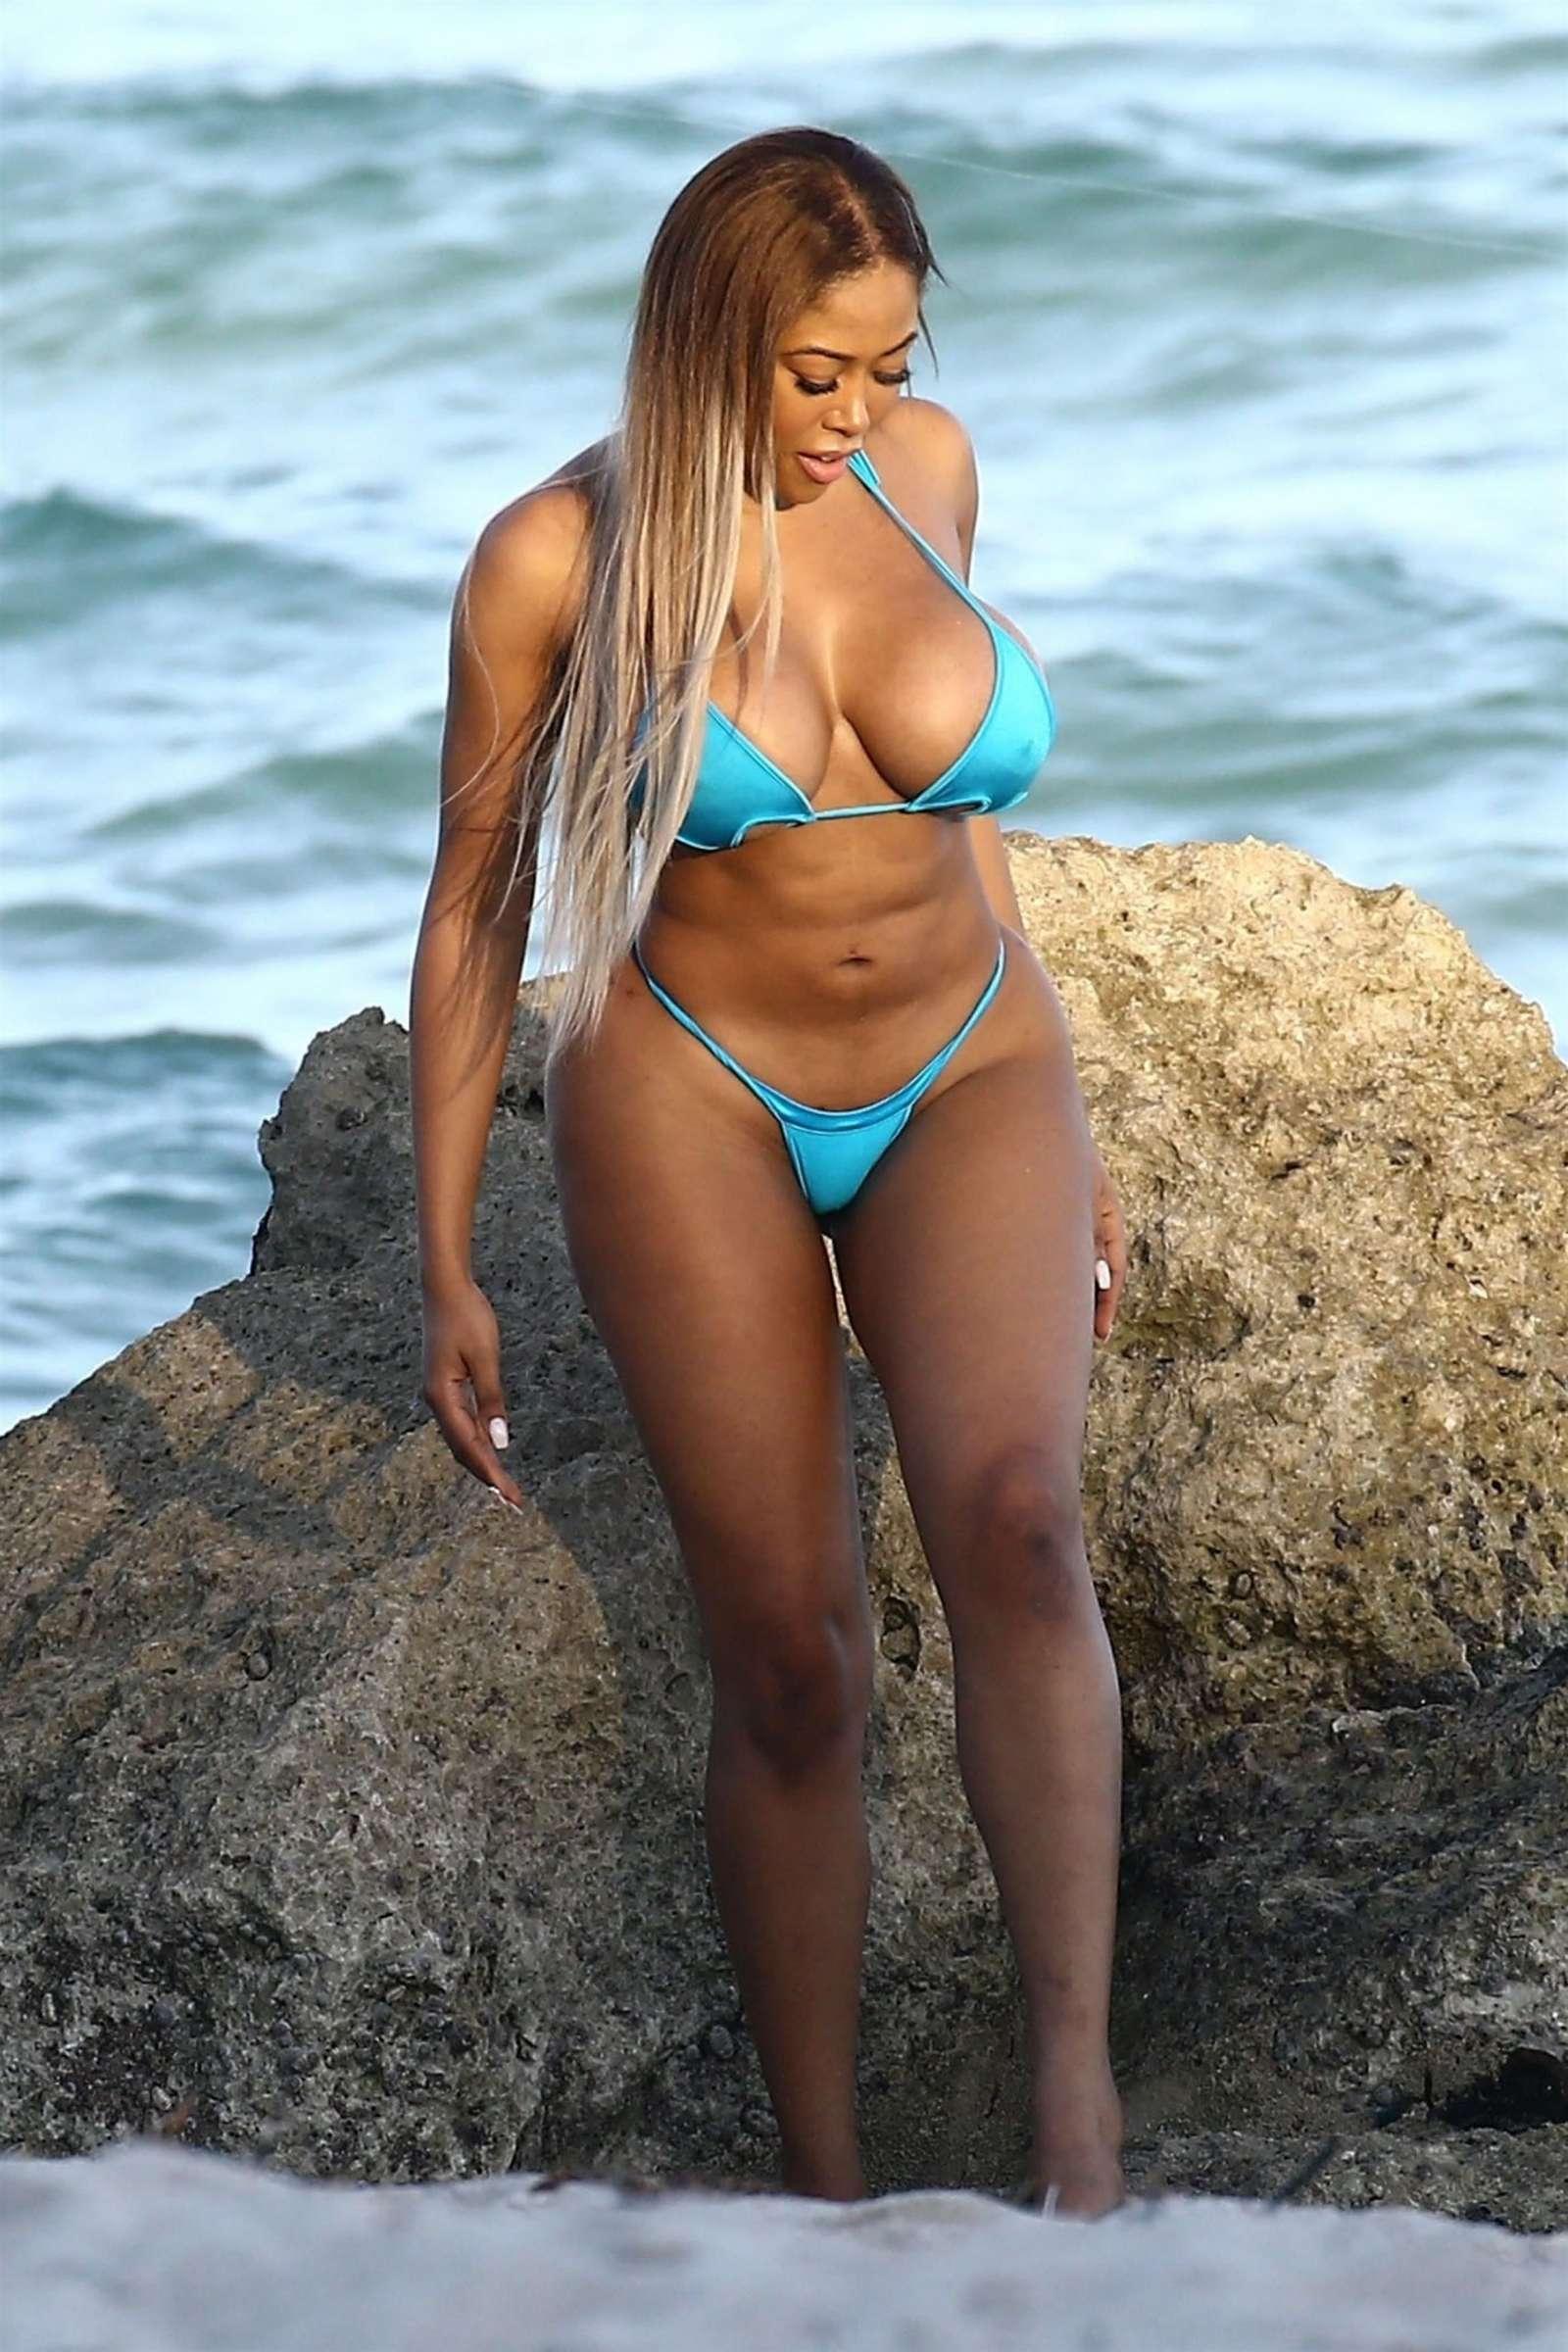 Moriah Mills 2017 : Moriah Mills in Bikini: Photoshoot -47